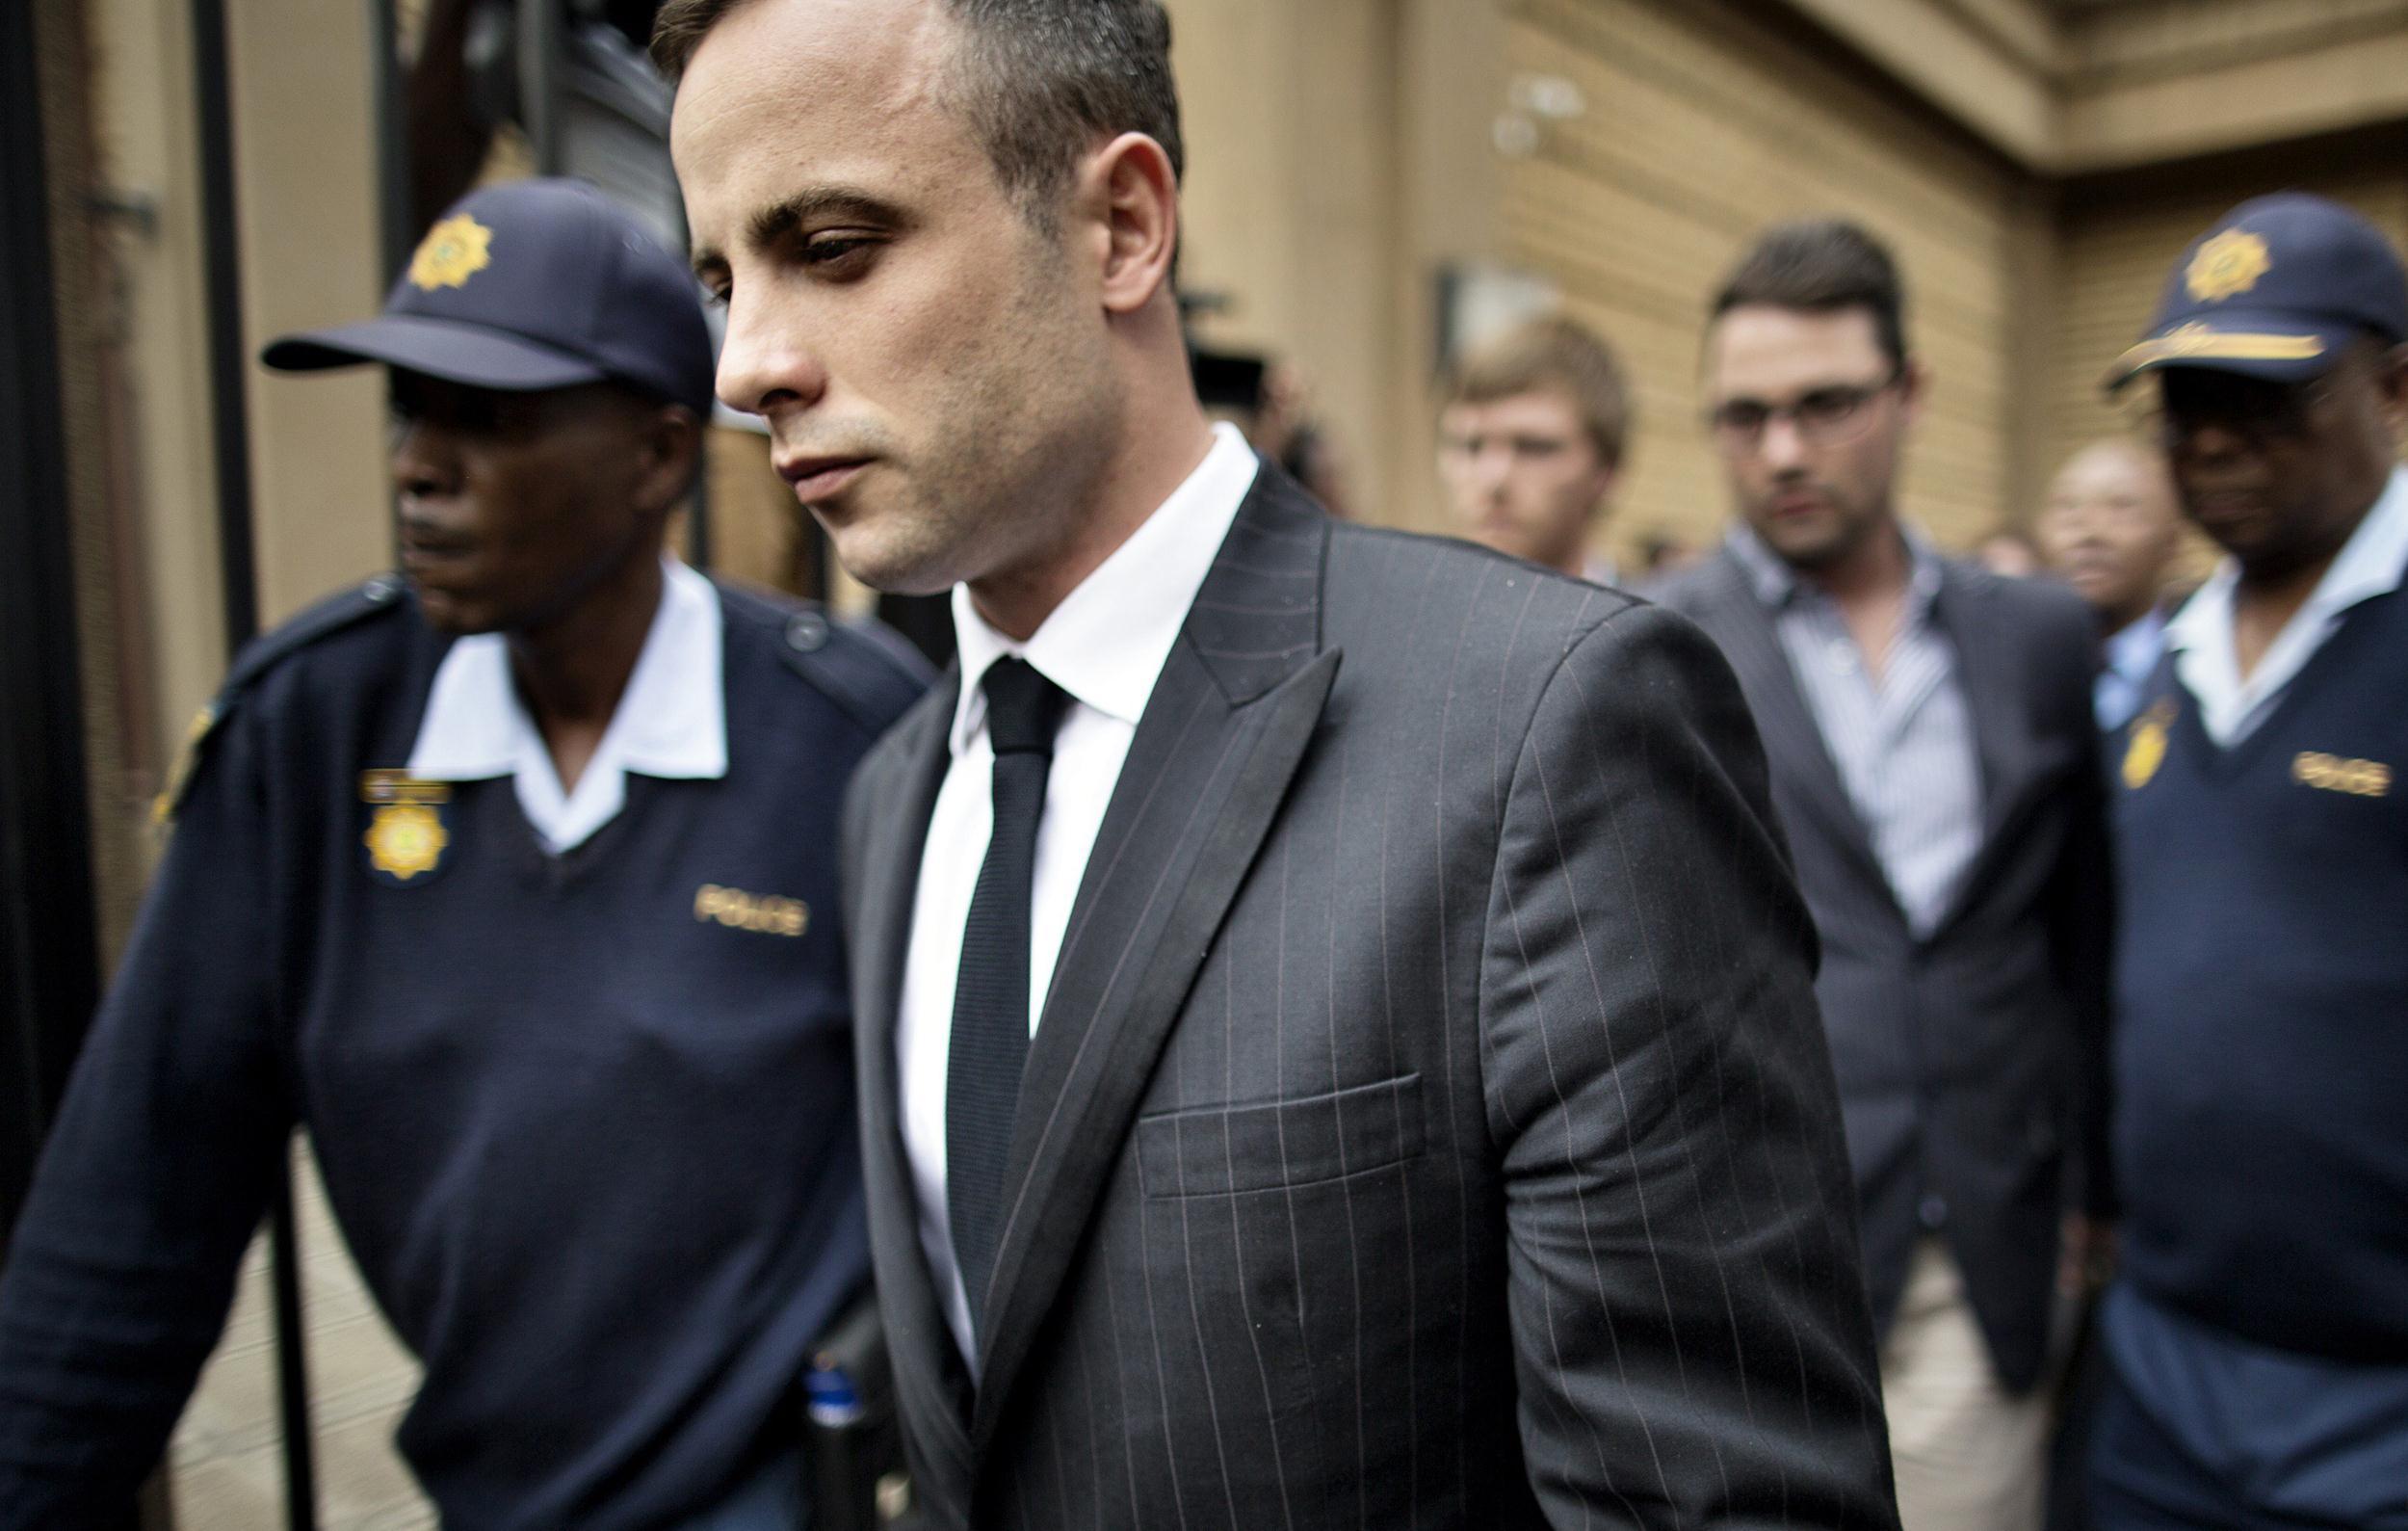 Oscas Pistorius leaves the North Gauteng High Court